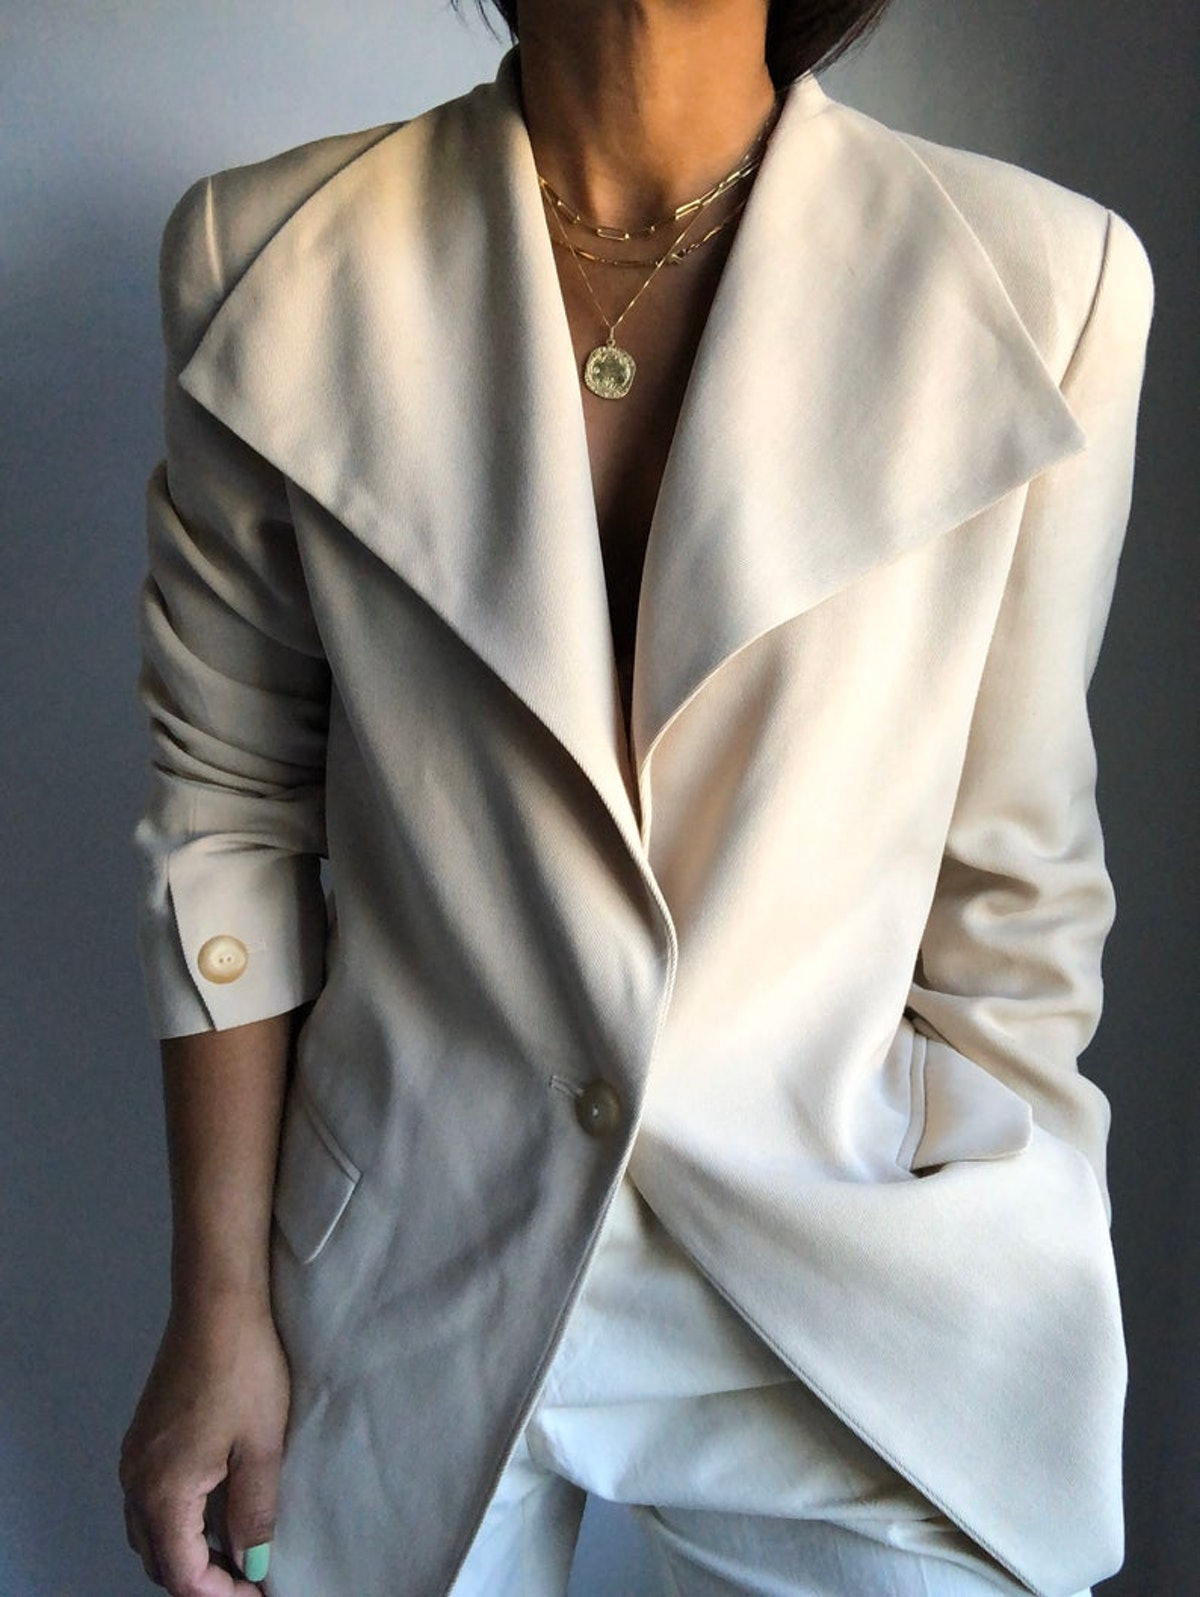 Vintage Essential '90s Max Mara Oversized Collar Sleek Blazer